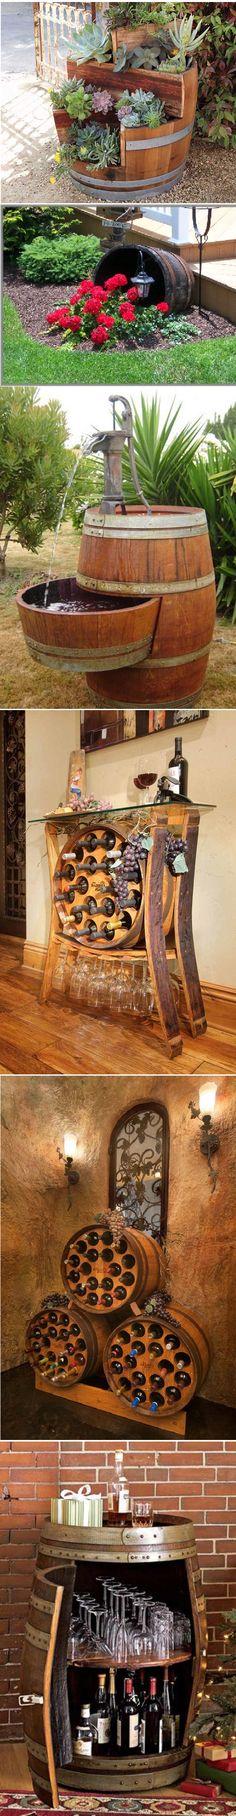 How To Repurpose Wine Barrels